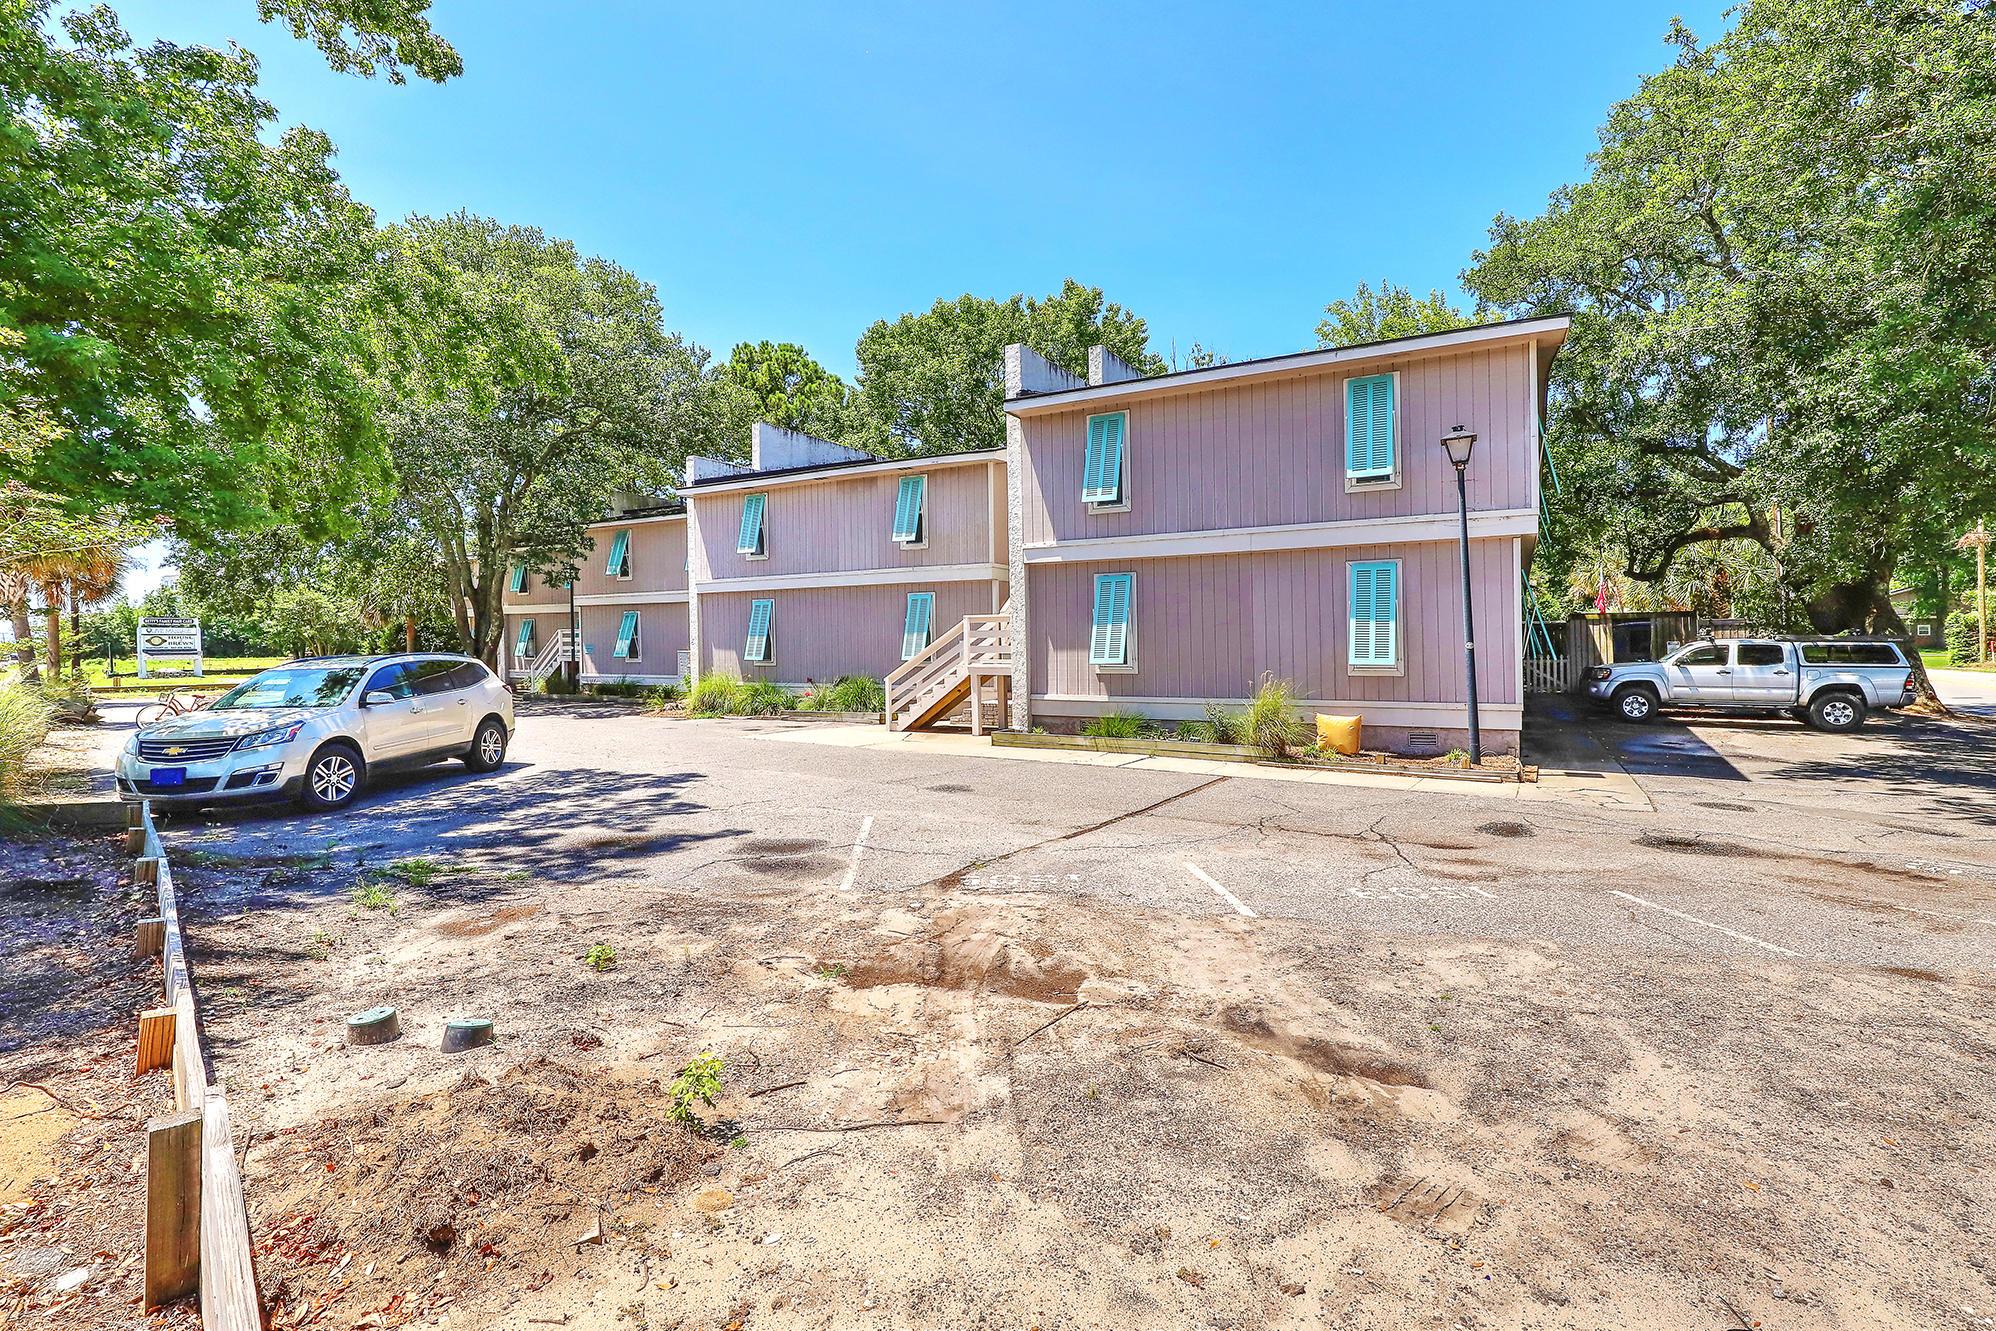 Marsh Grass Condominiums Homes For Sale - 1501 Ben Sawyer, Mount Pleasant, SC - 0